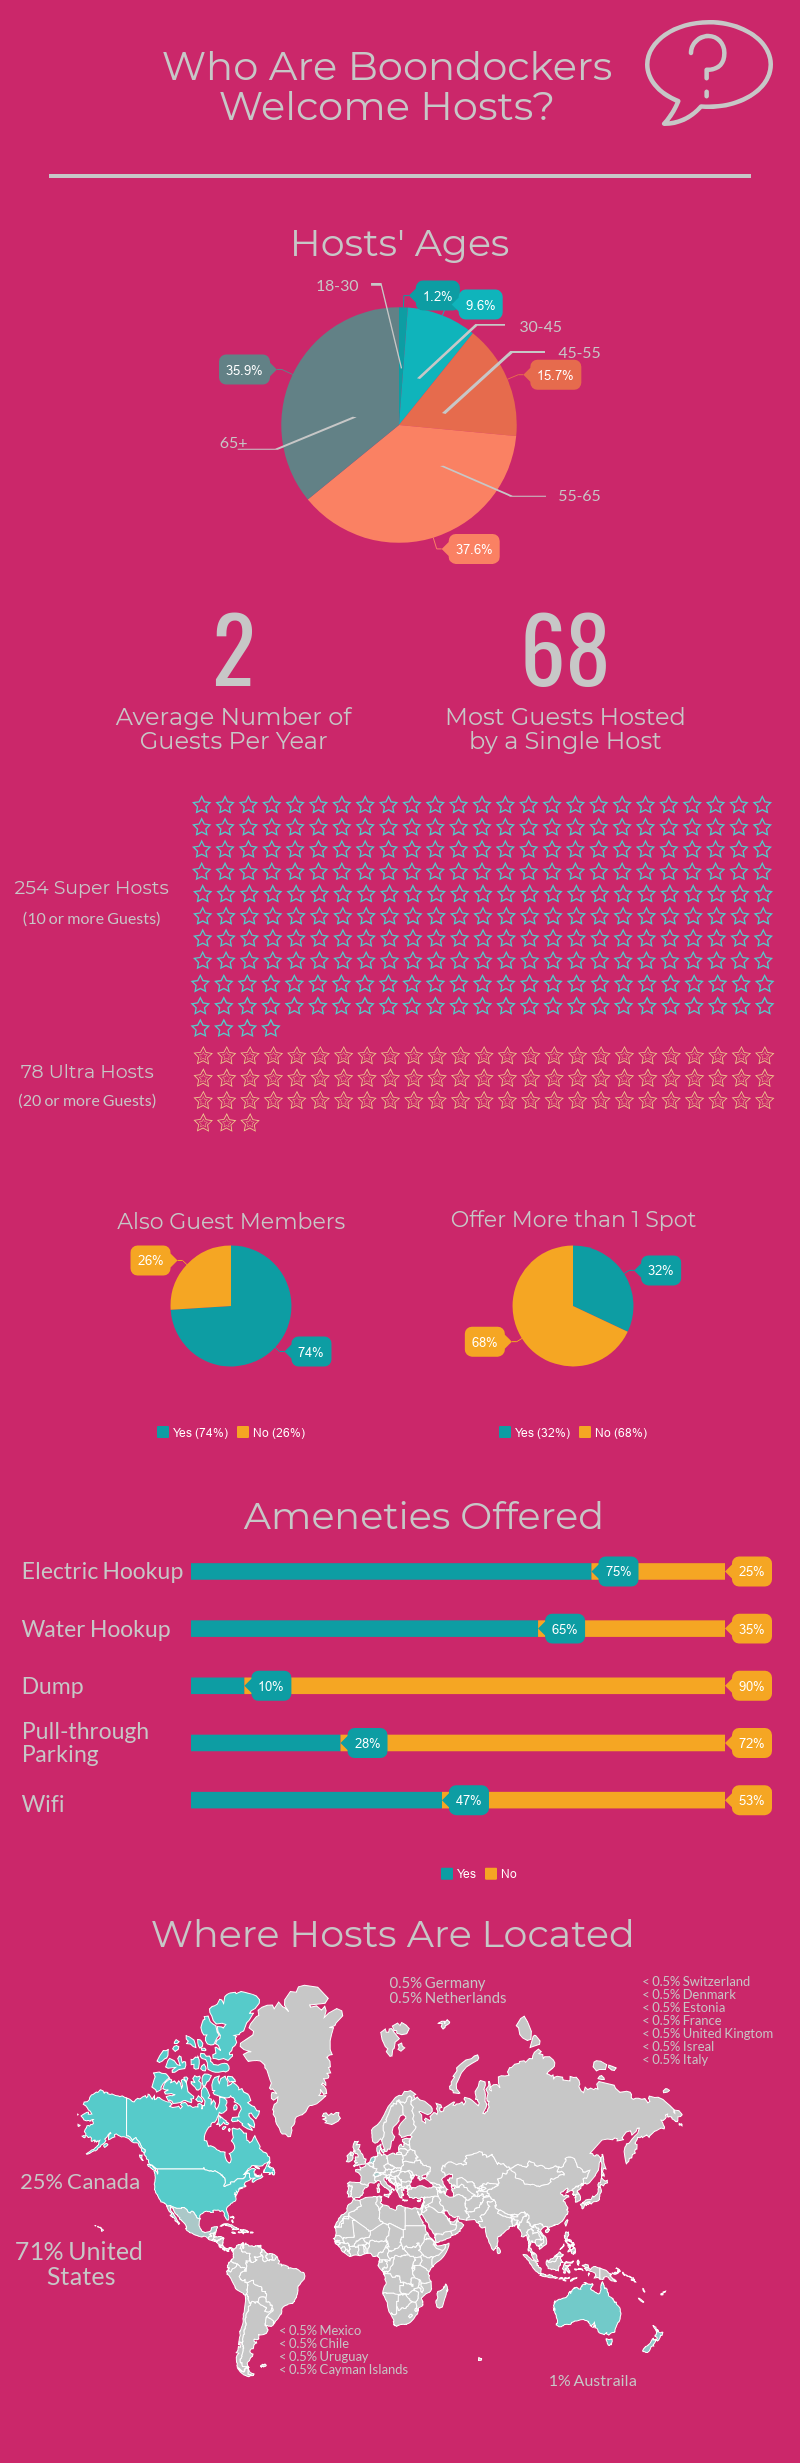 Boondockers Welcome Hosts Infographic